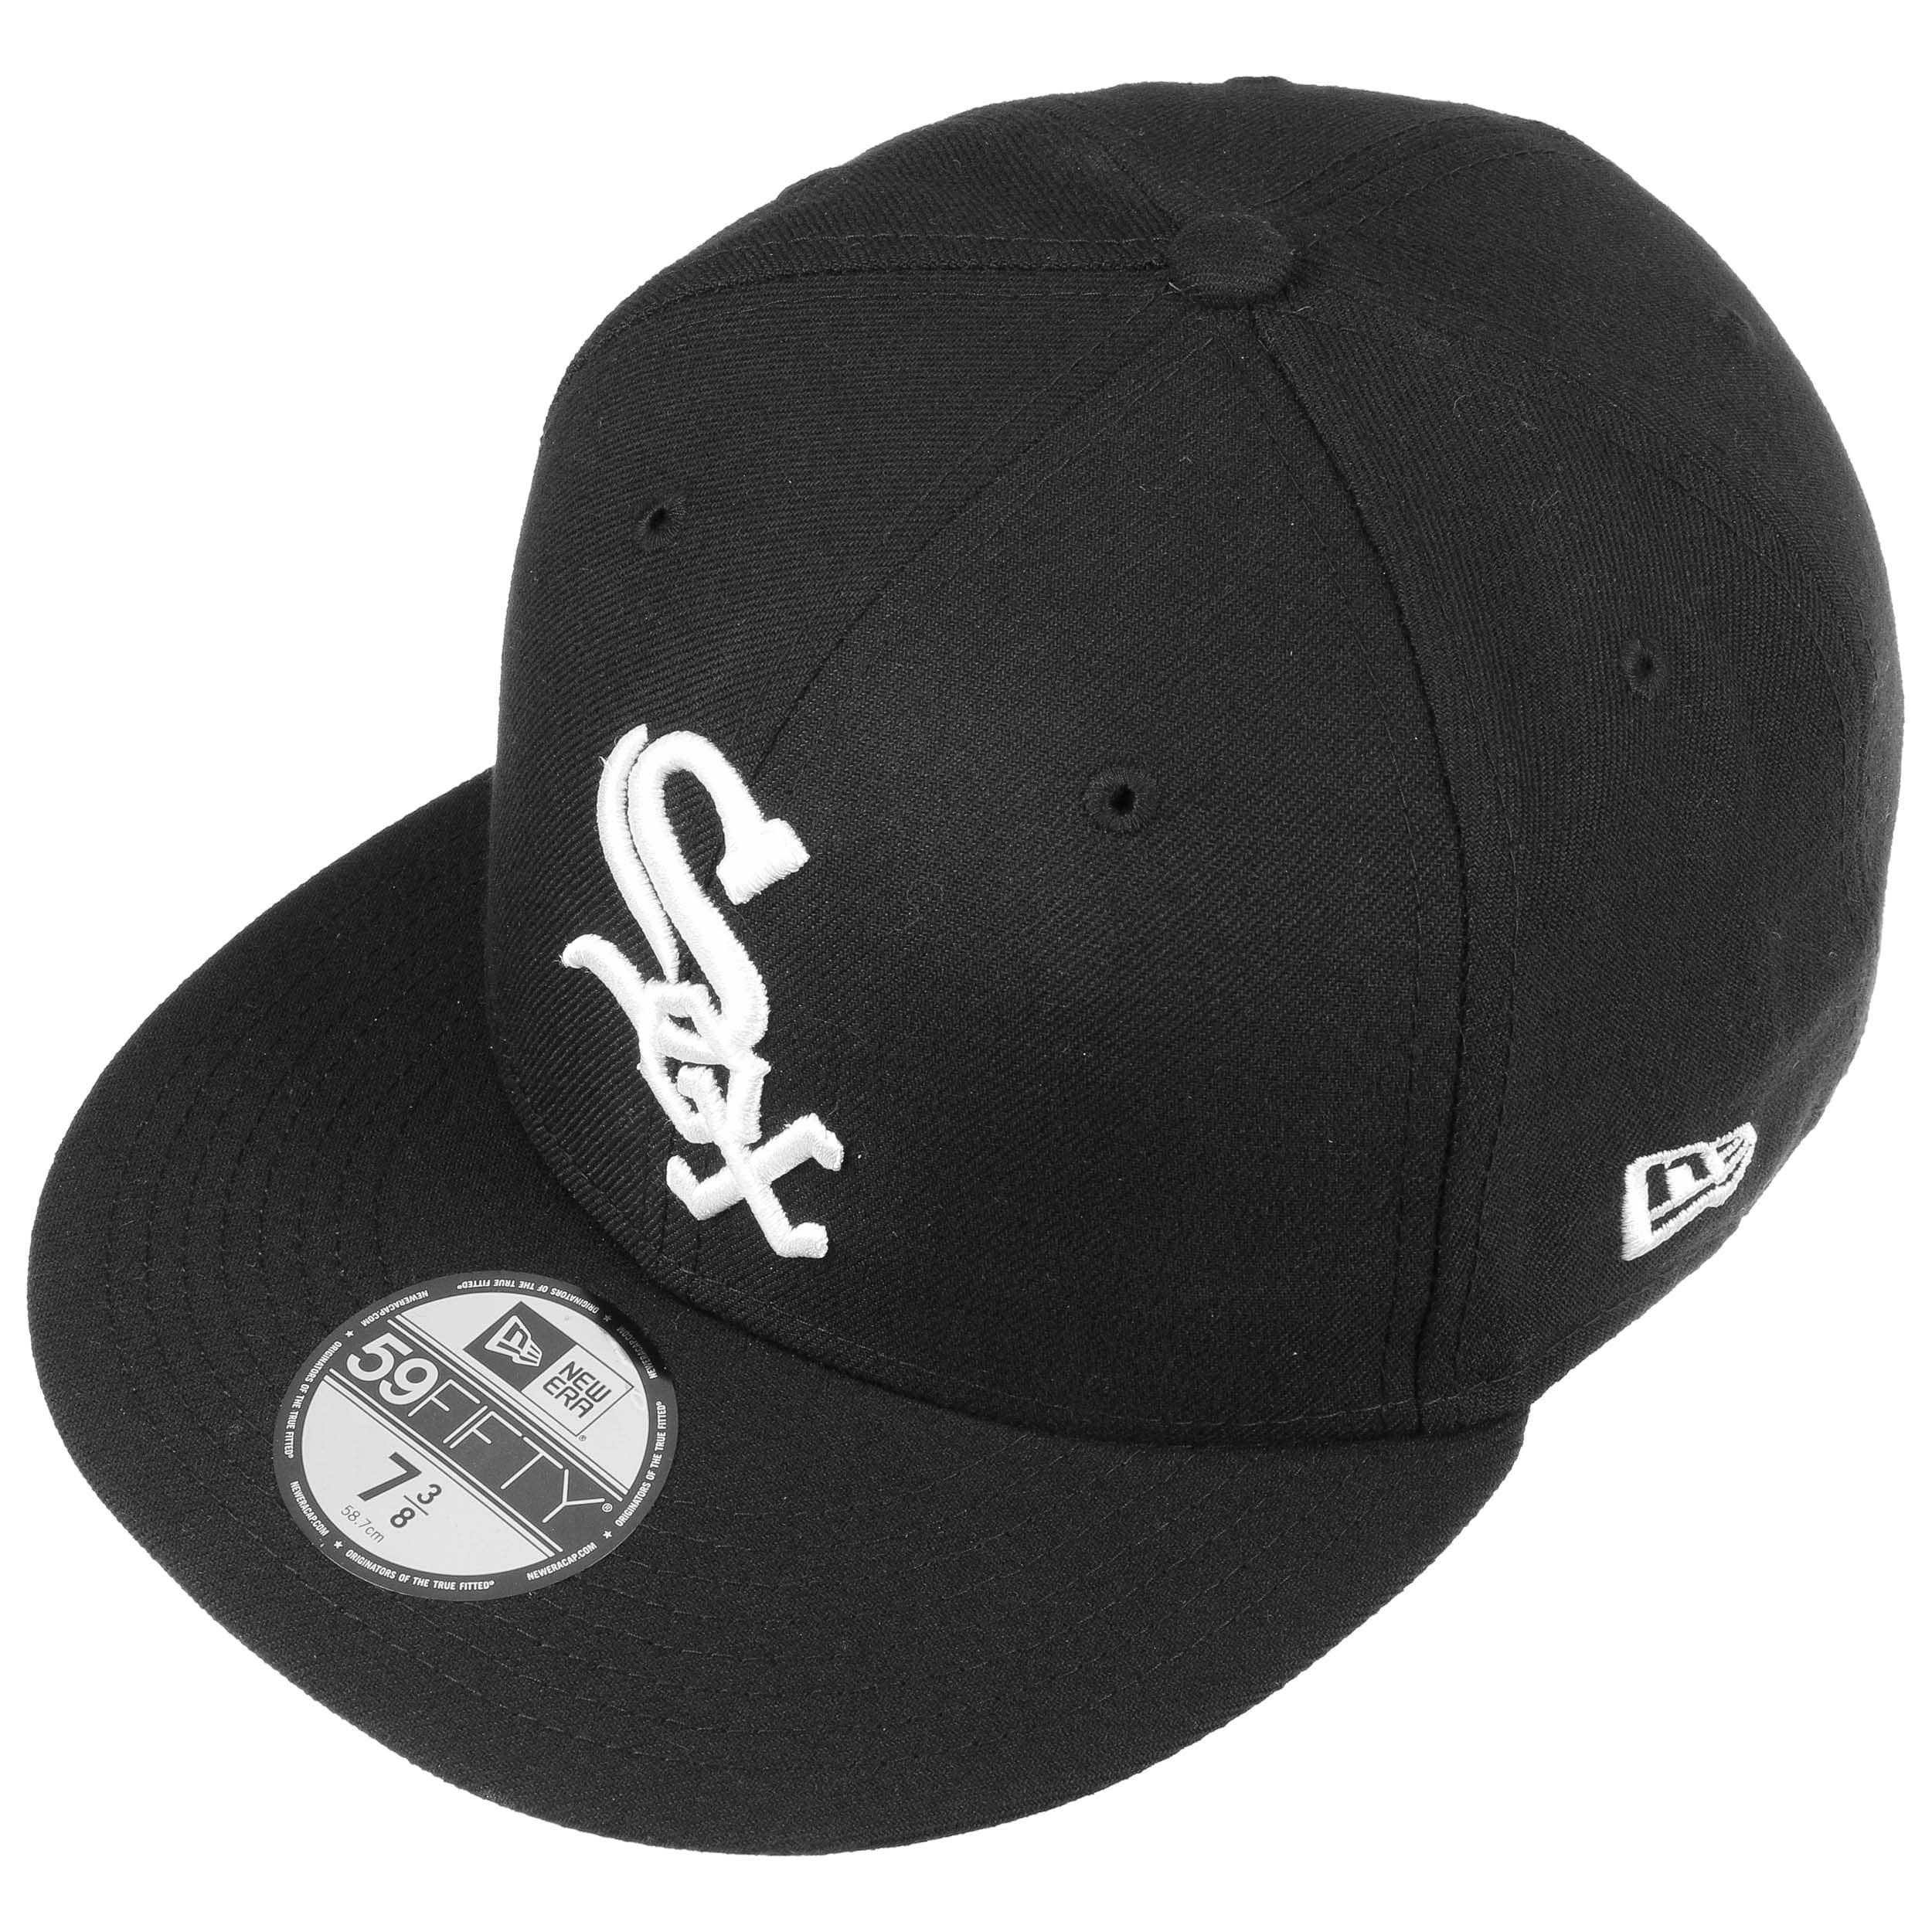 319bfd491fe10 Gorra 59Fifty TSF White Sox by New Era - Gorras - sombreroshop.es